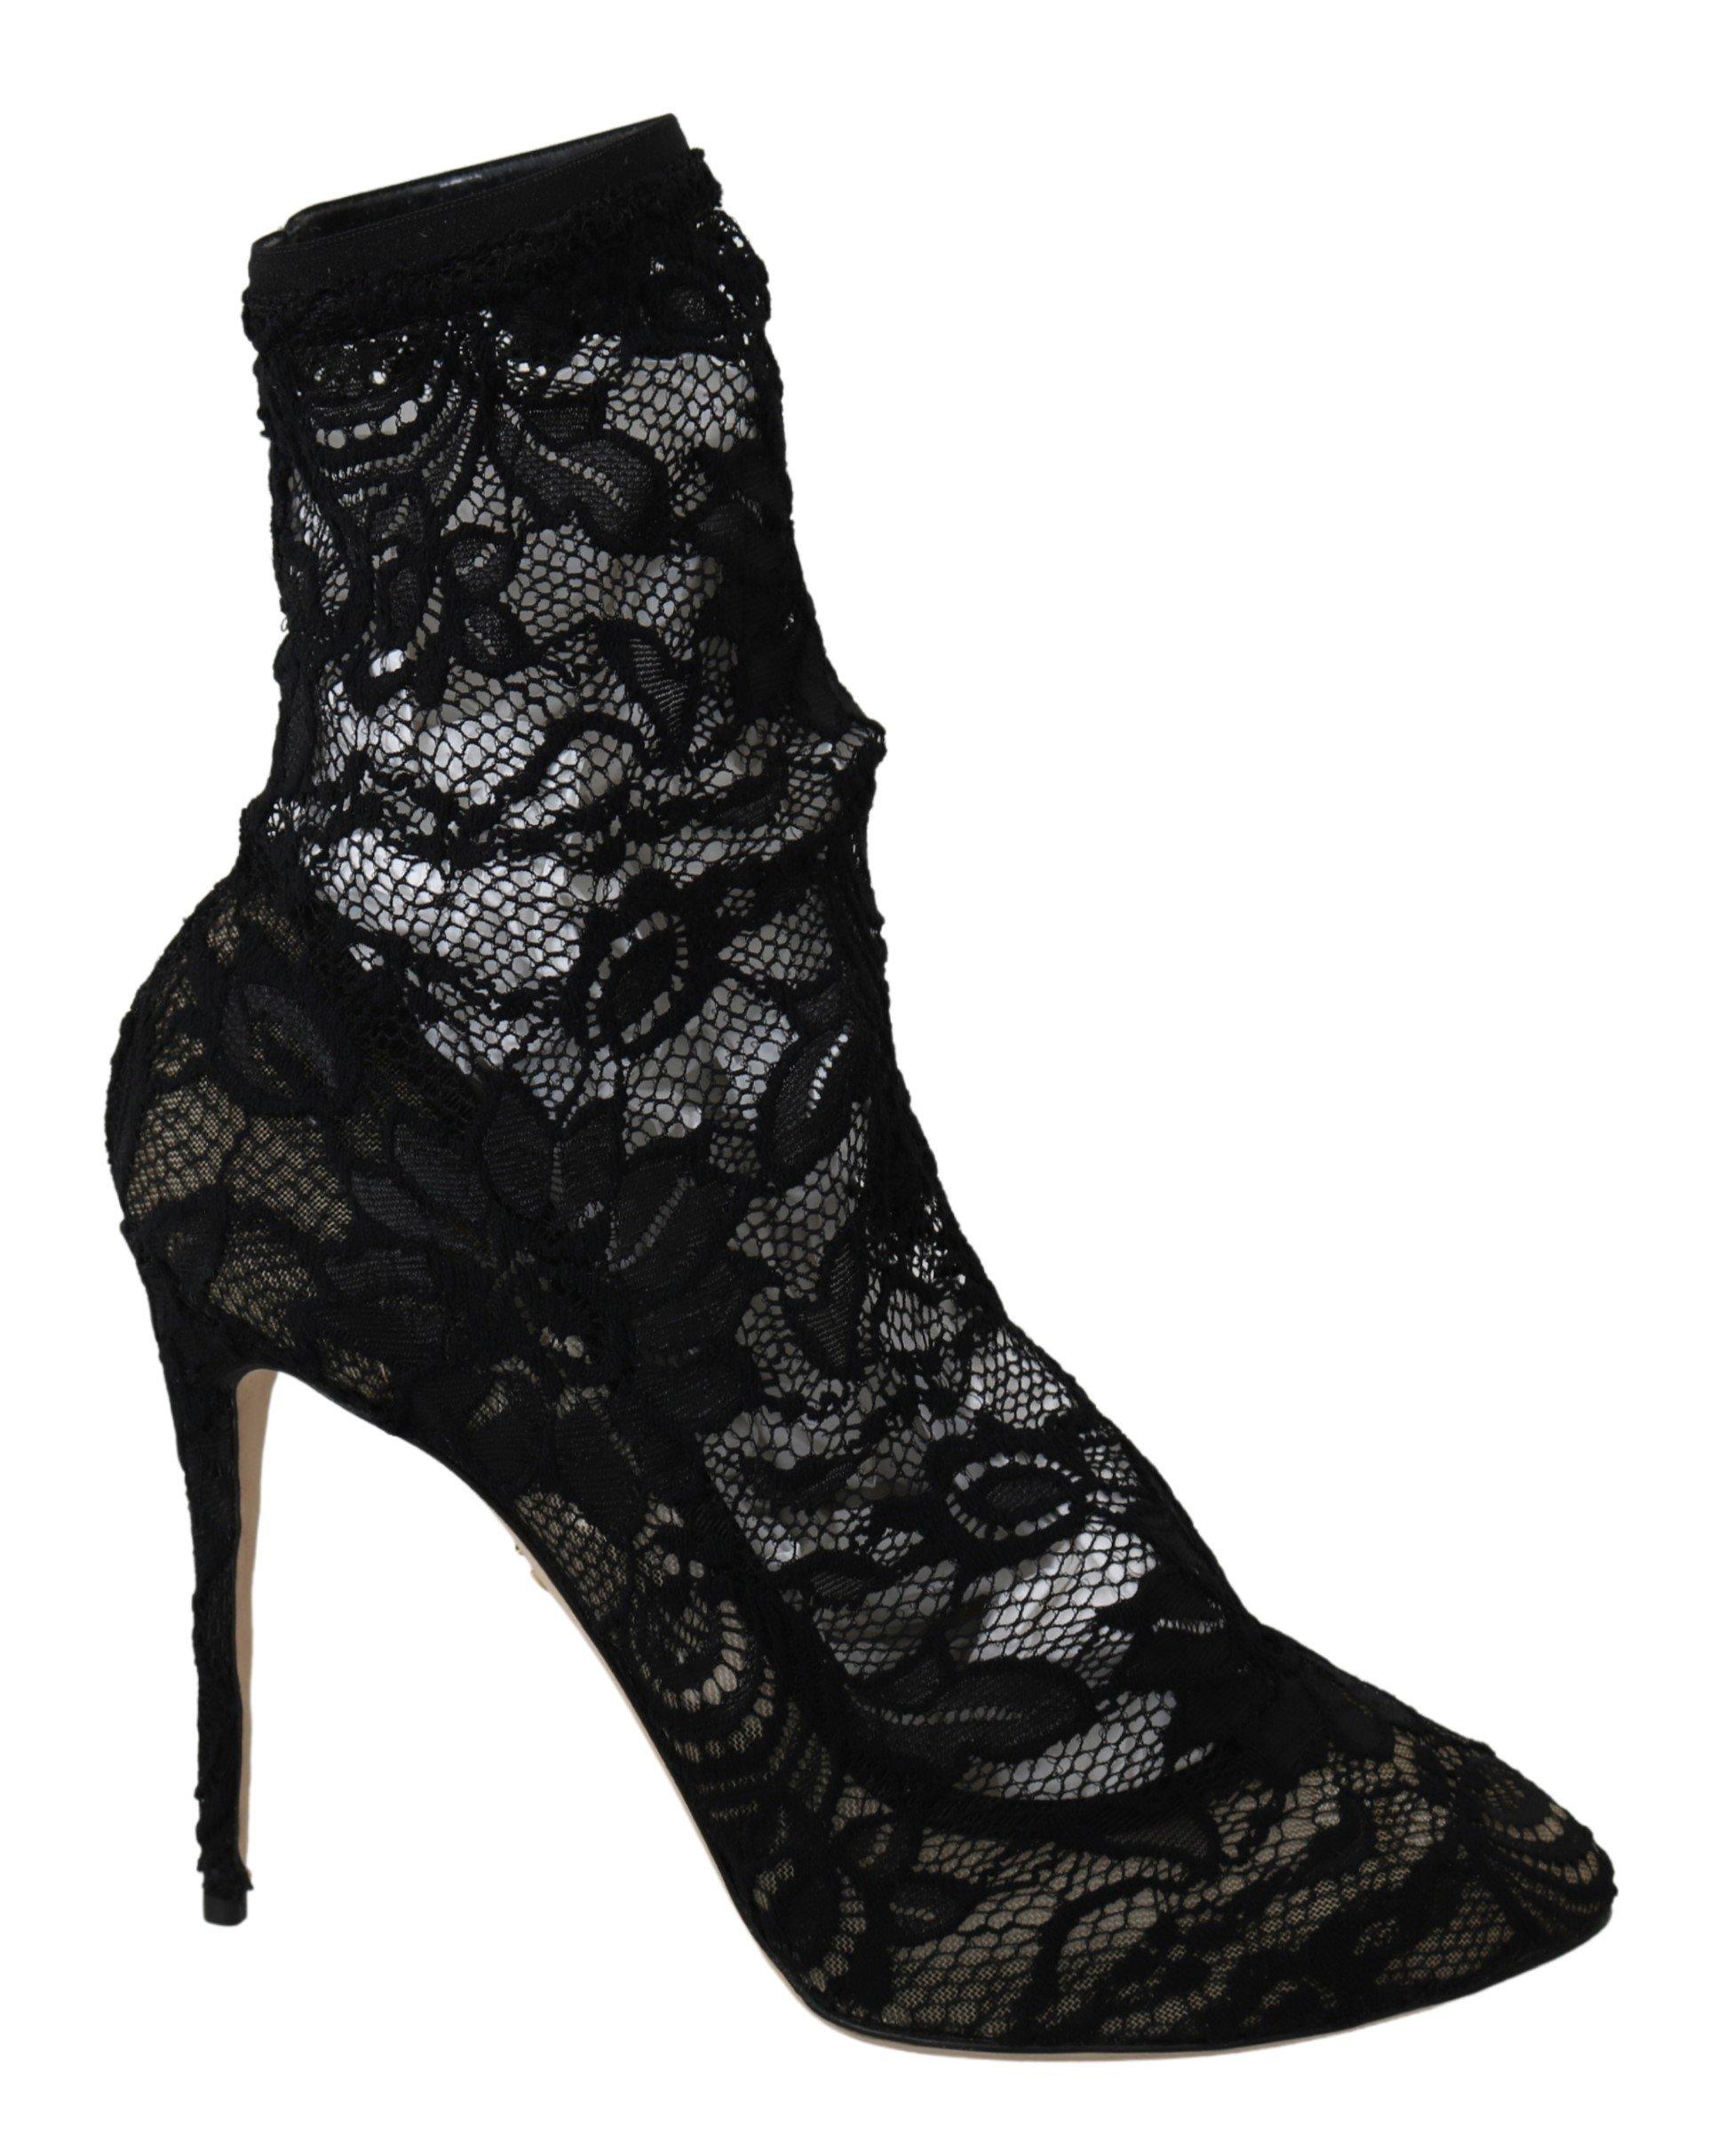 Dolce & Gabbana Women's Lace Taormina High Heel Pumps Black LA6956 - EU40/US9.5